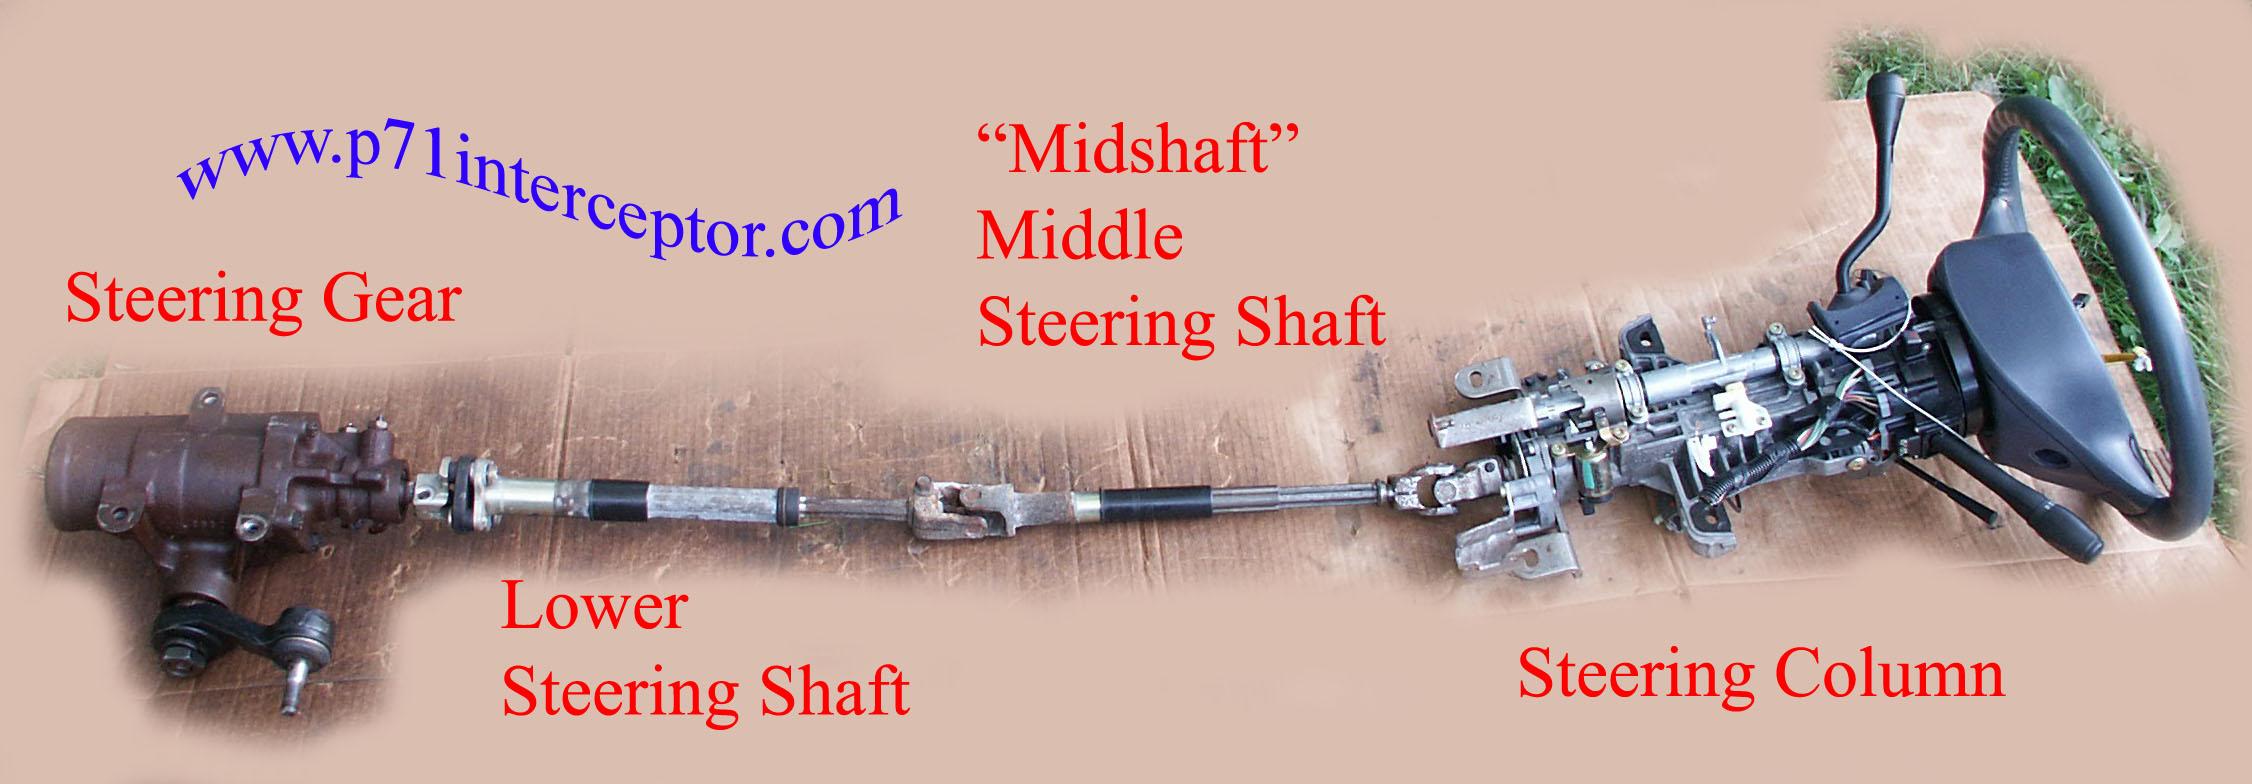 steering column linkage suspension msc adams crown victoria p71interceptor front performance software